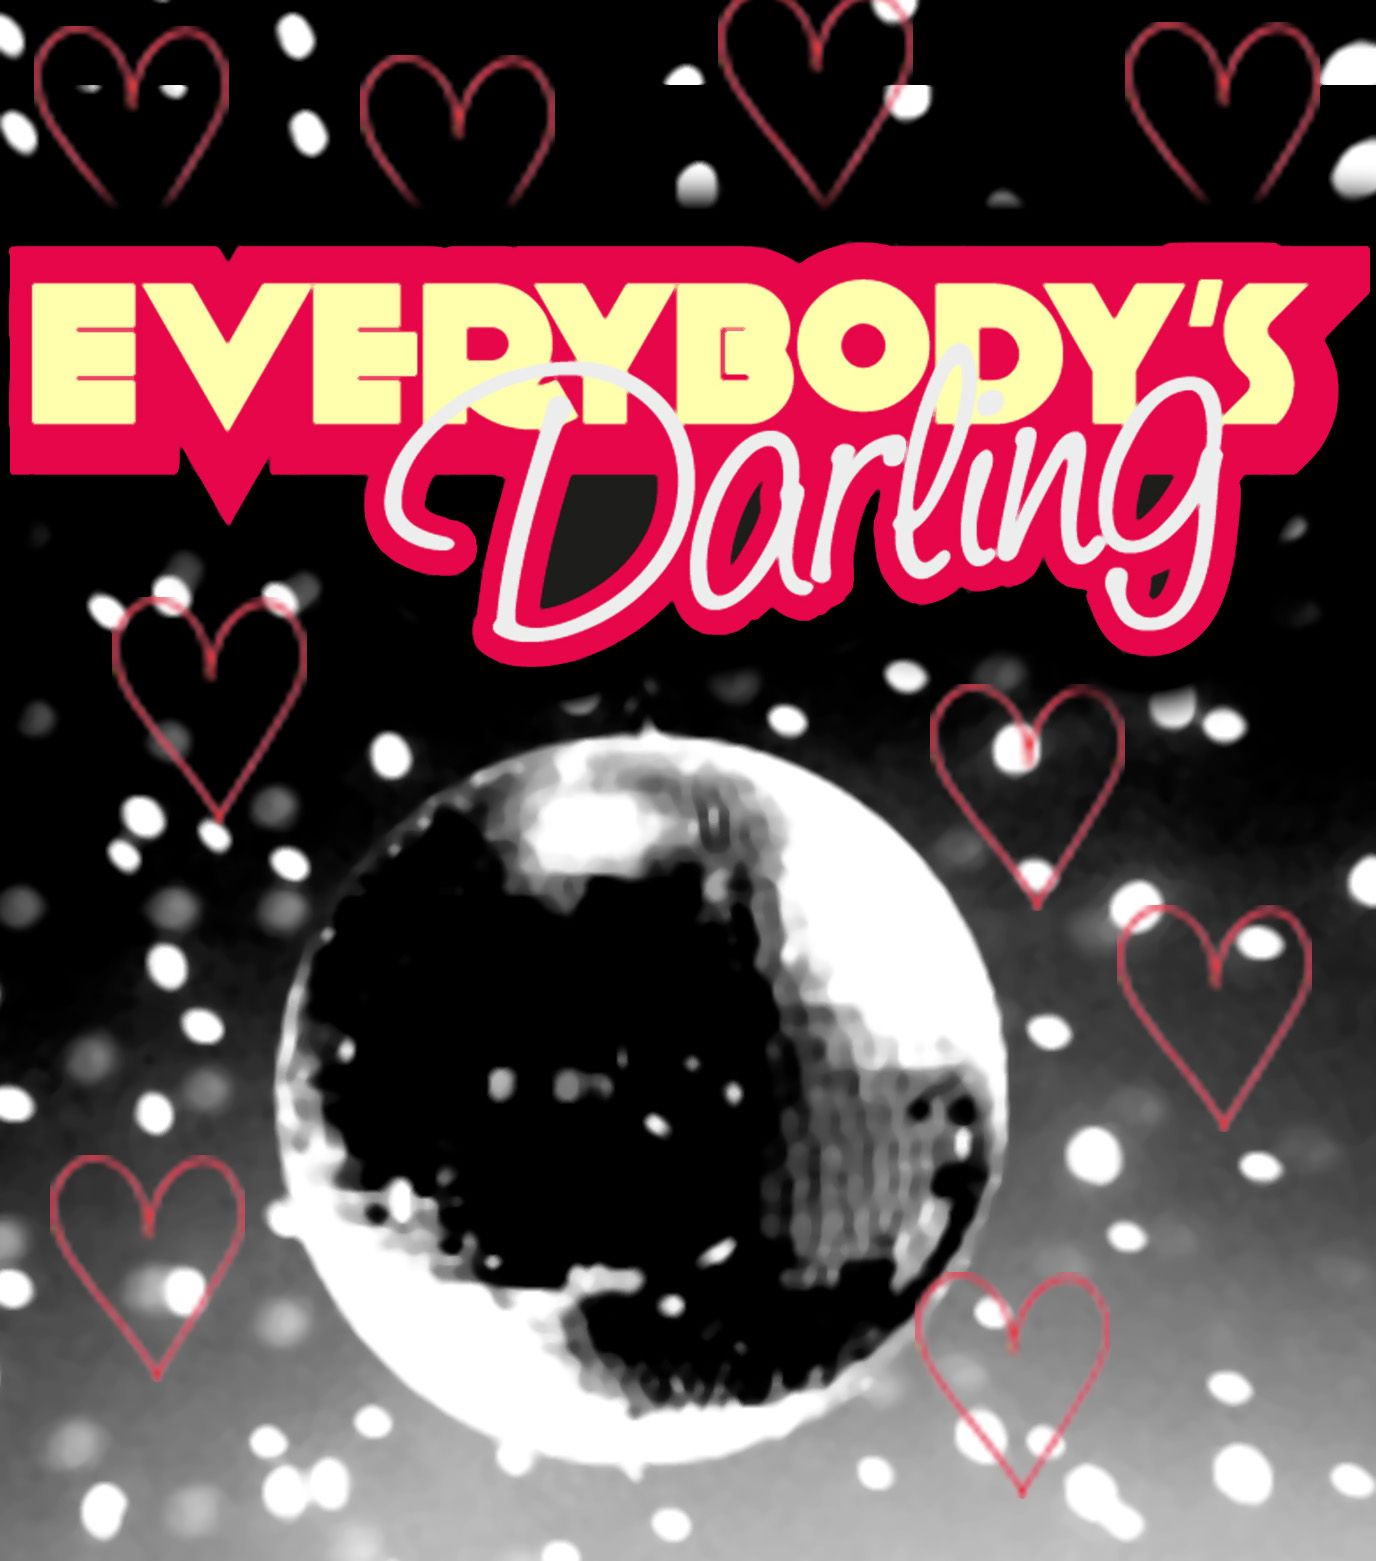 simple disco fun and lots of fun for everyone